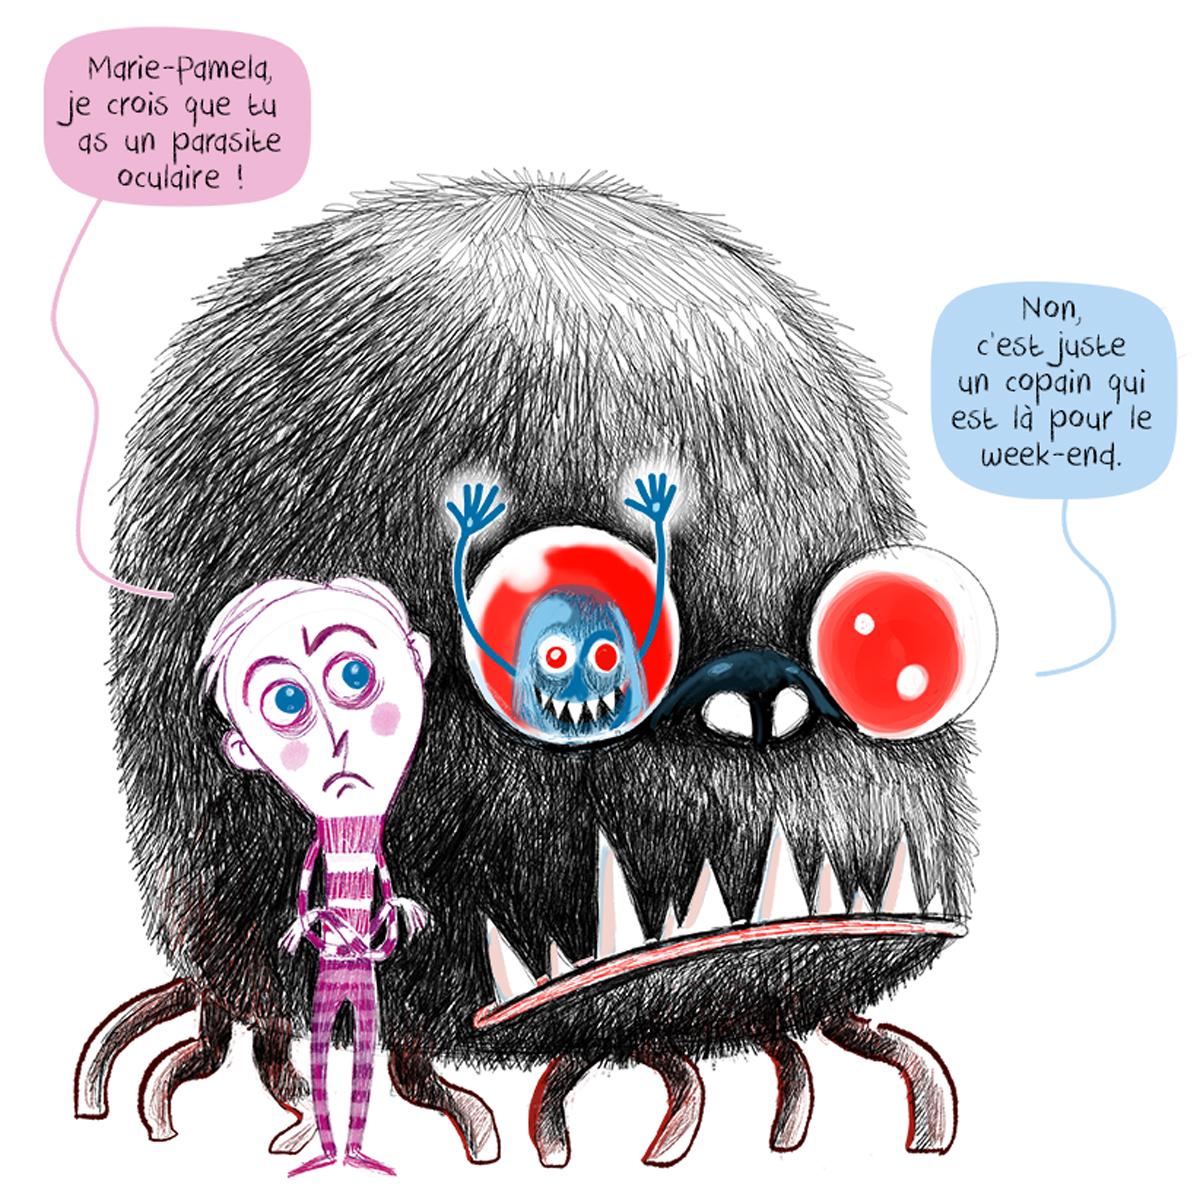 En week-end dans le Monstre. Spending the week-end inside the Monster...